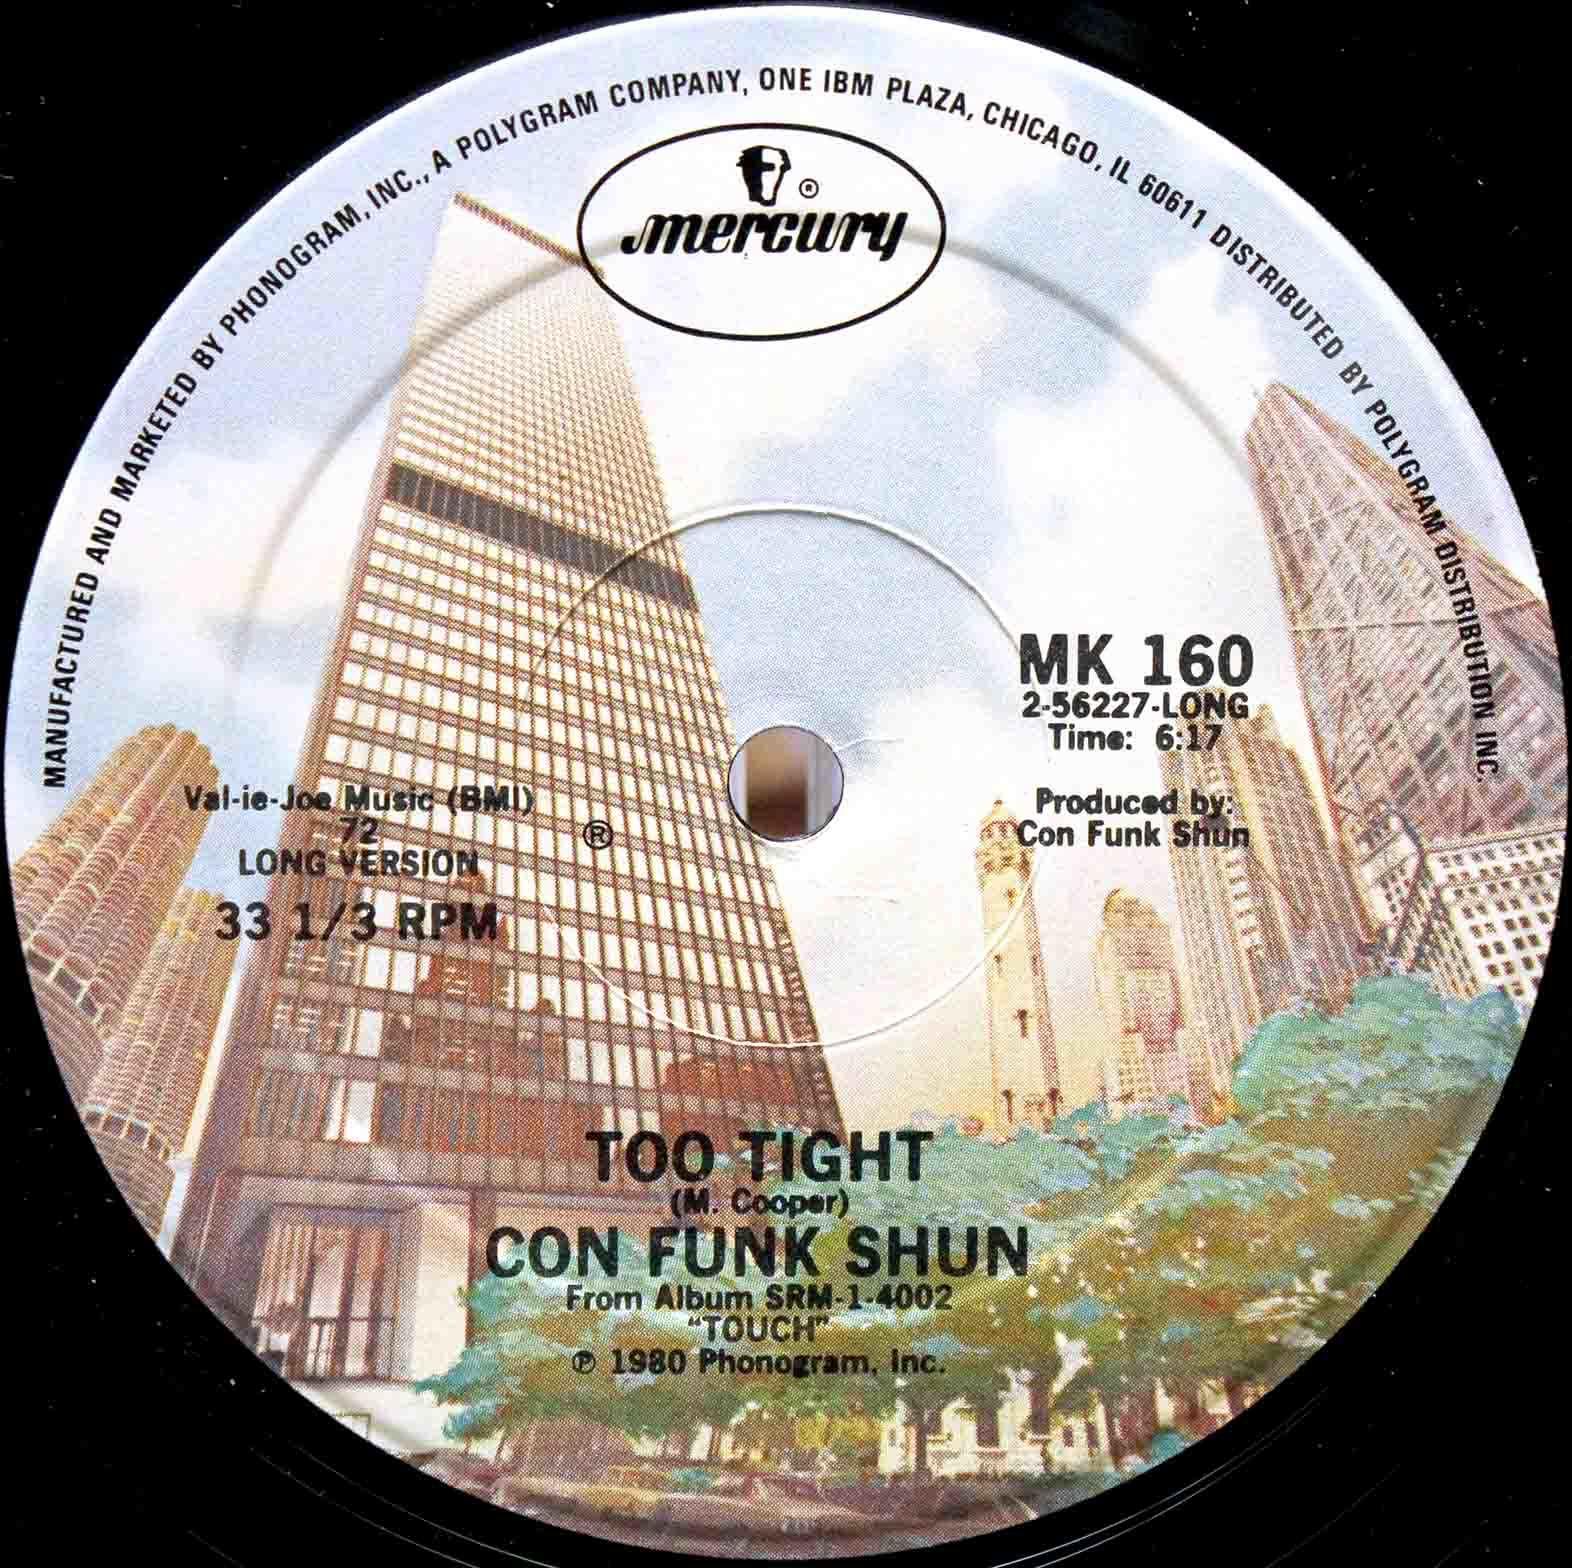 Con Funk Shun – Too Tight 02